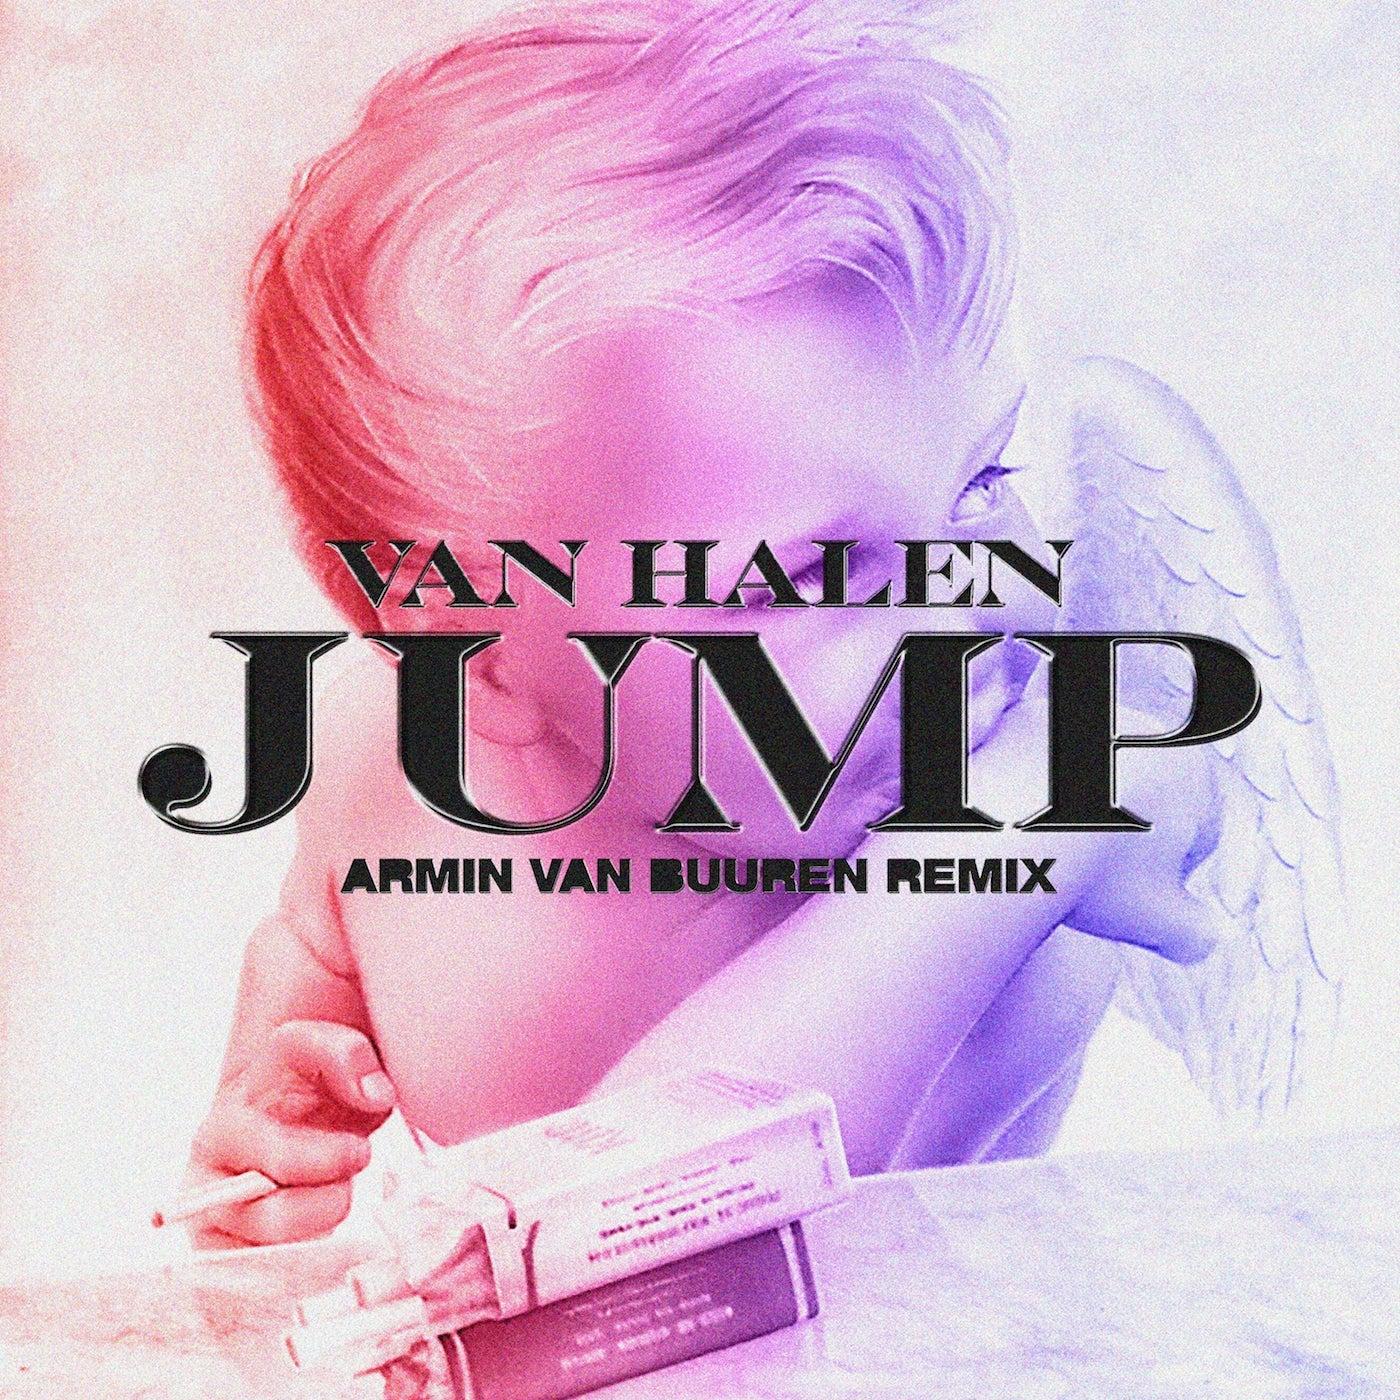 Jump (Armin van Buuren Extended Mix)